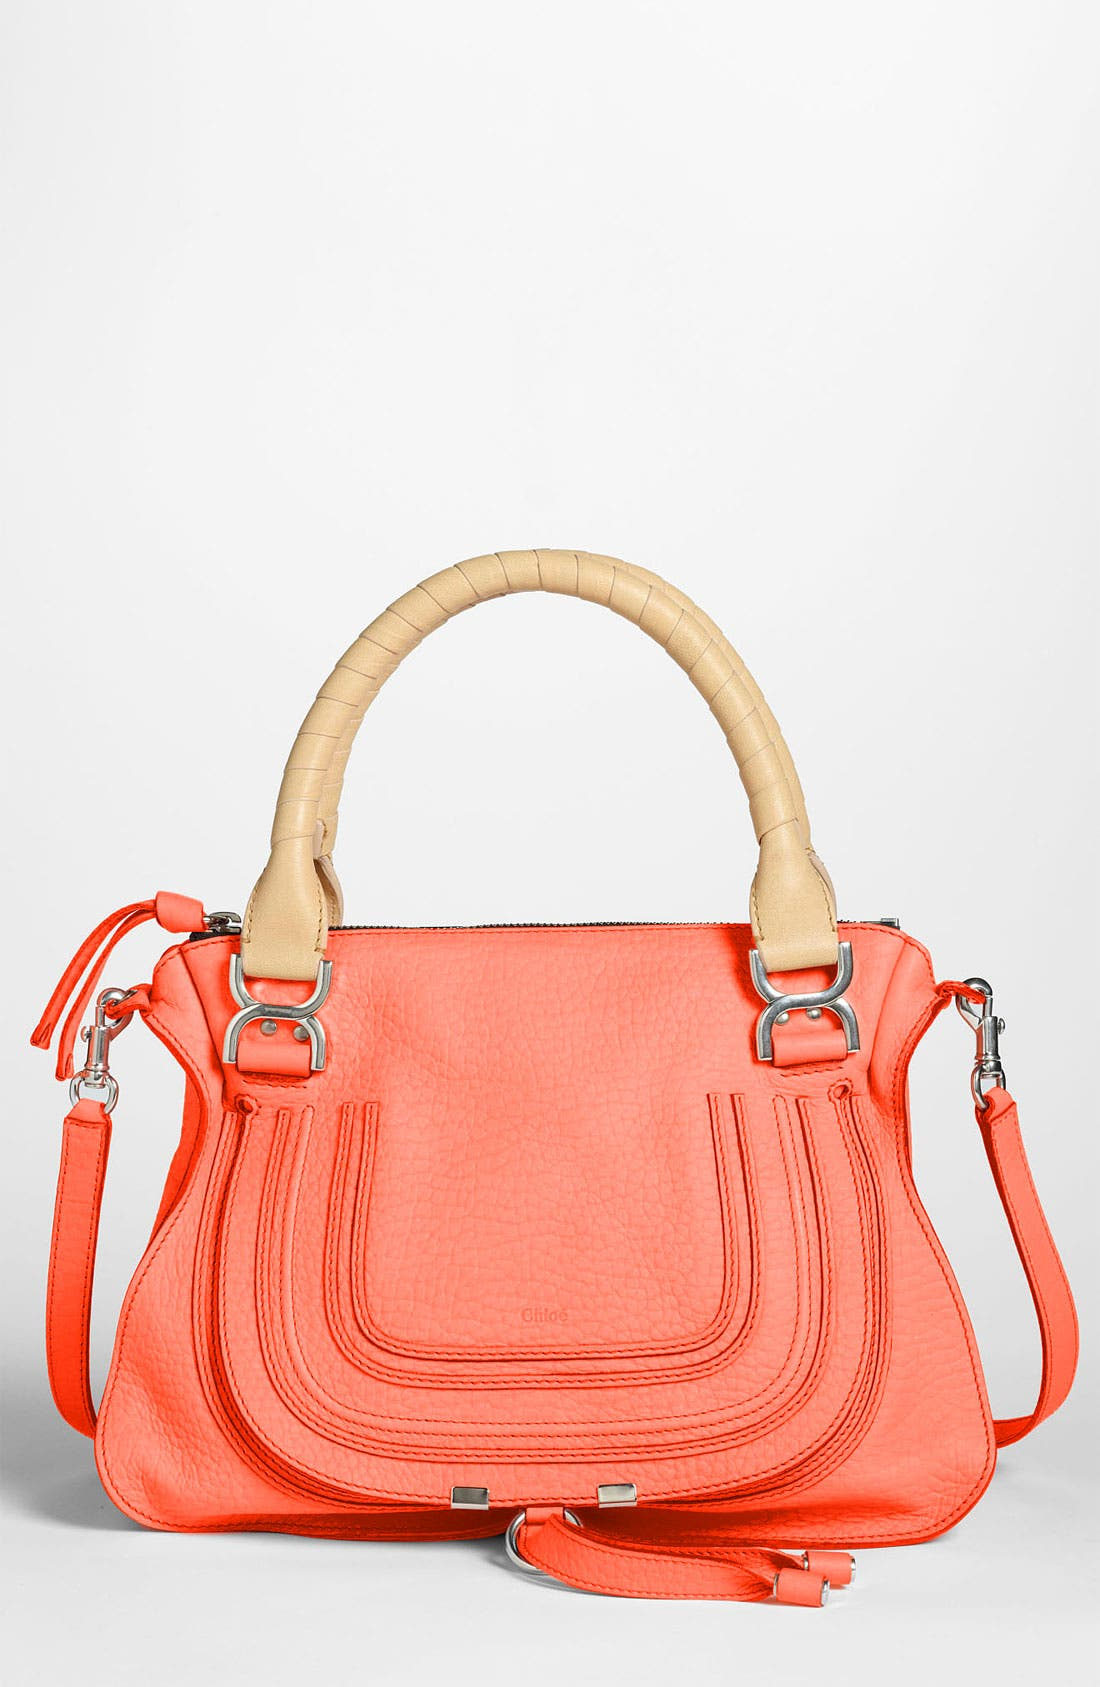 Main Image - Chloé 'Marcie - Small' Leather Satchel